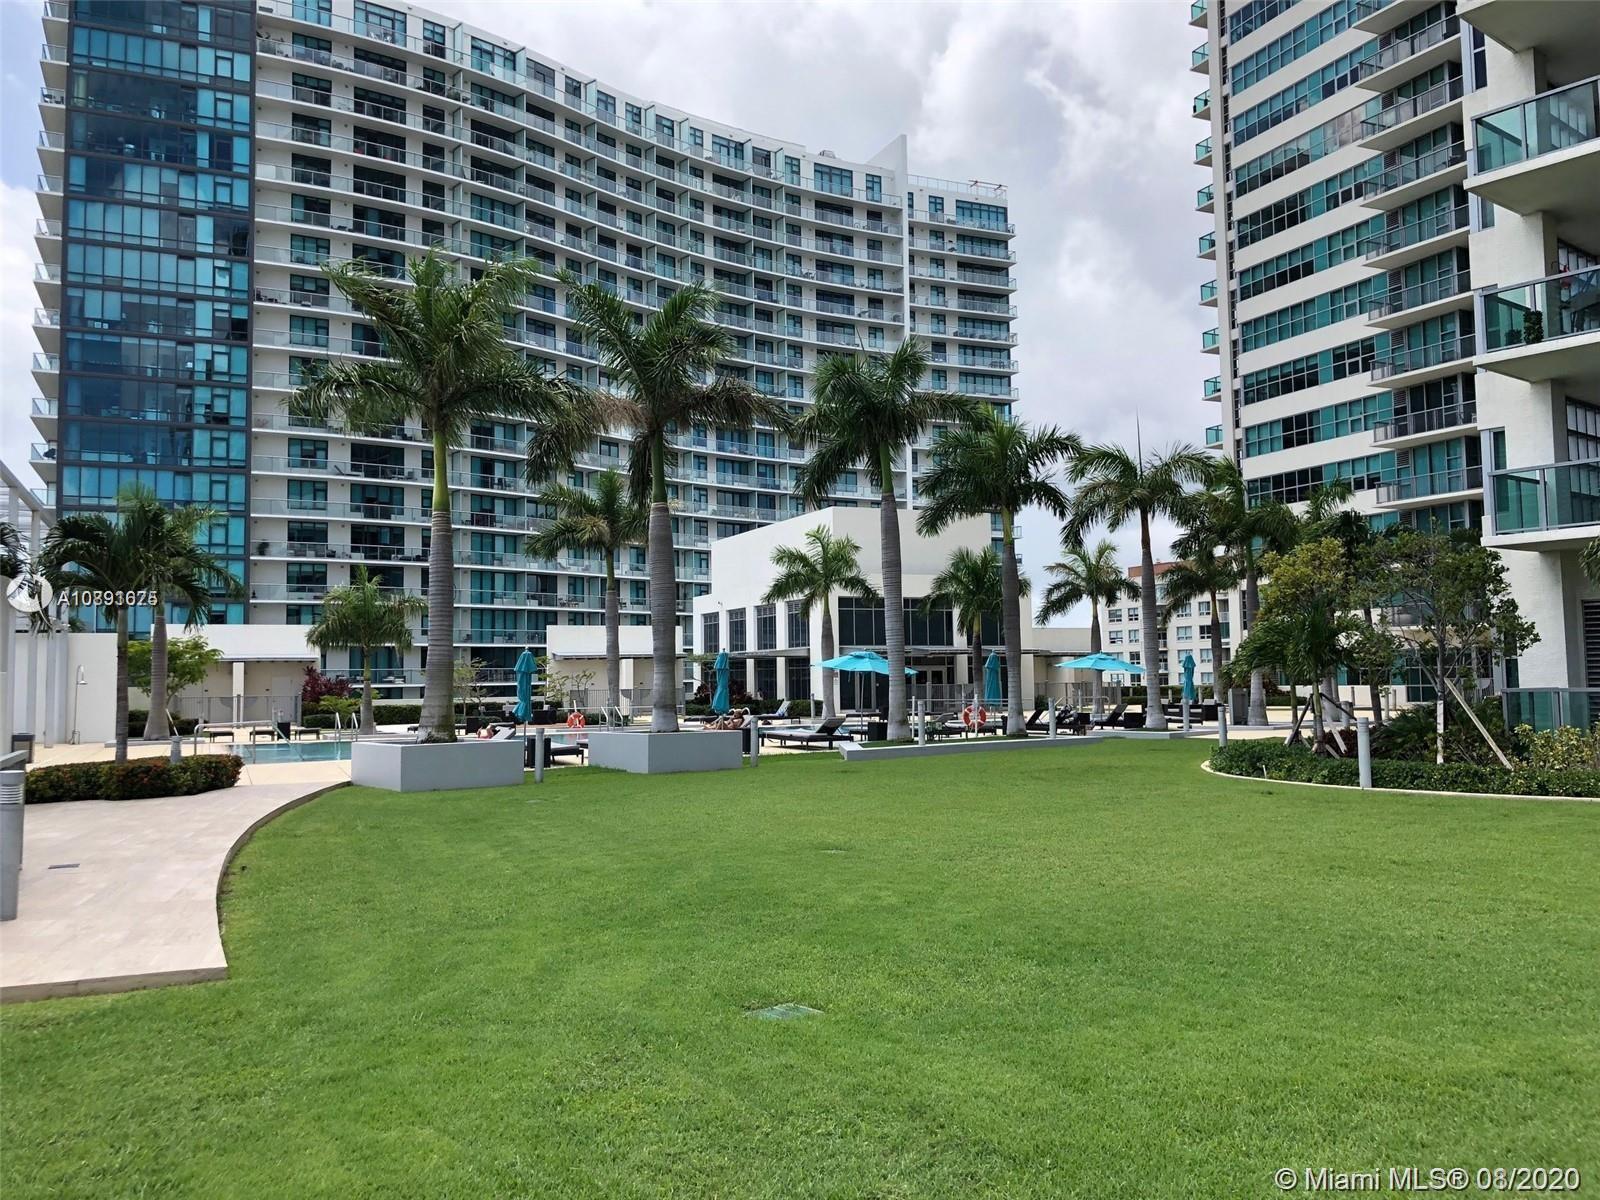 4 Midtown #H1806 - 3301 NE 1st Ave #H1806, Miami, FL 33137